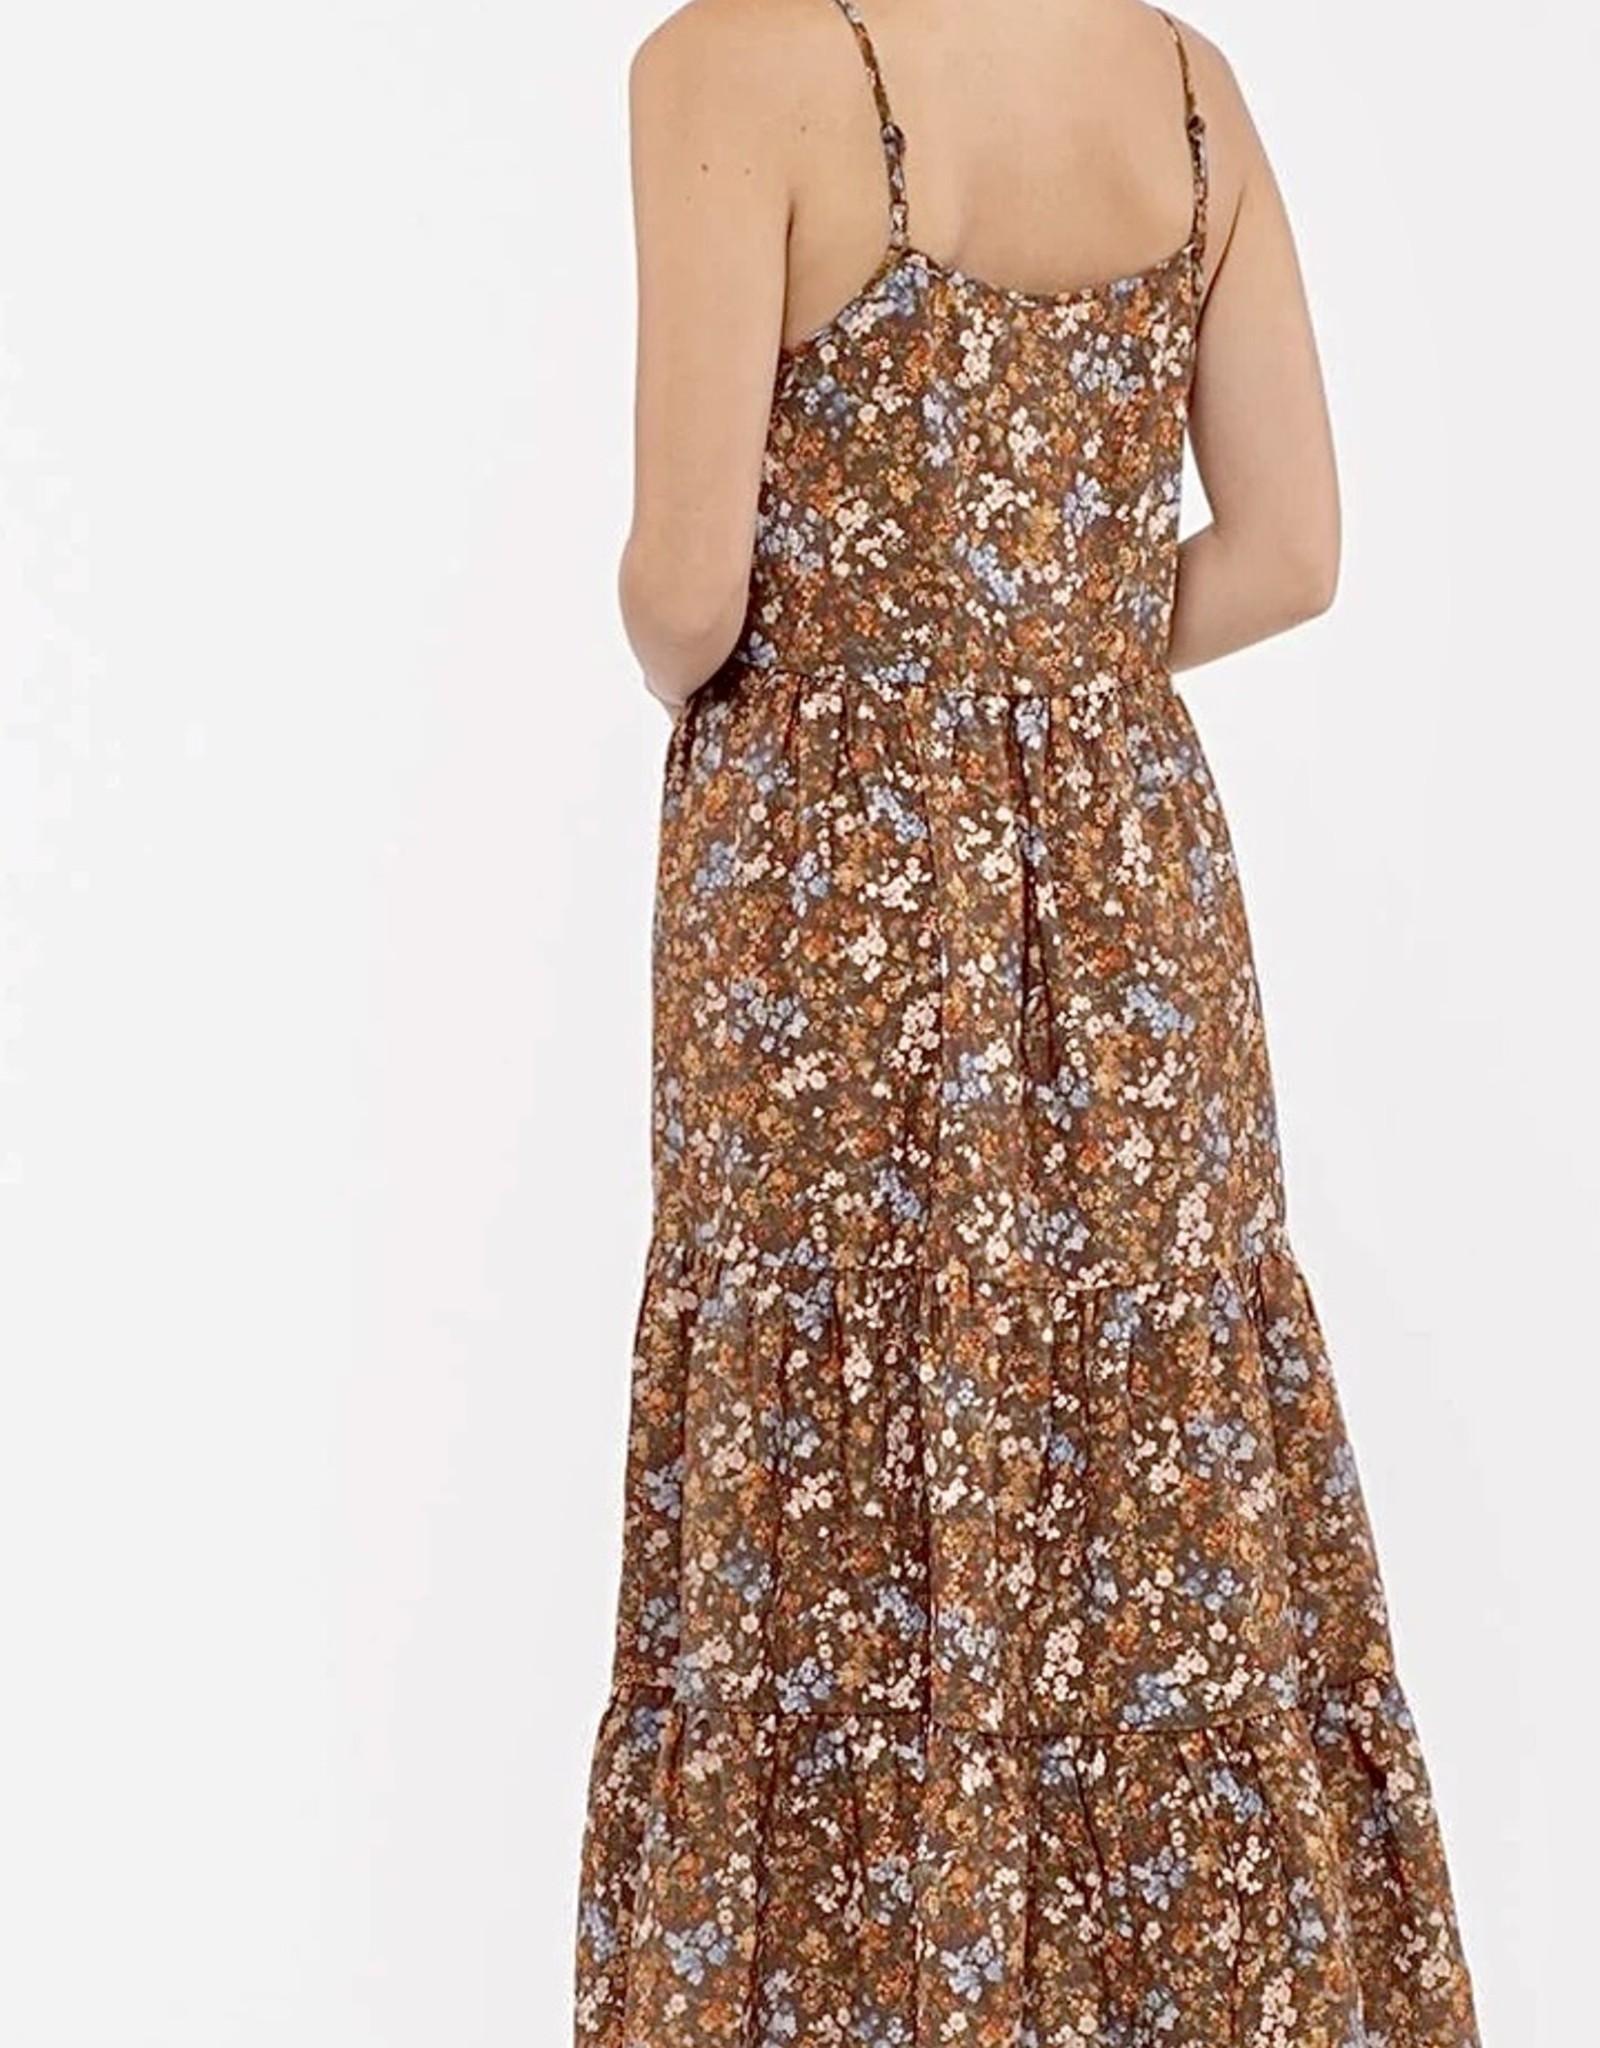 HUSH BRIELLE midi dress